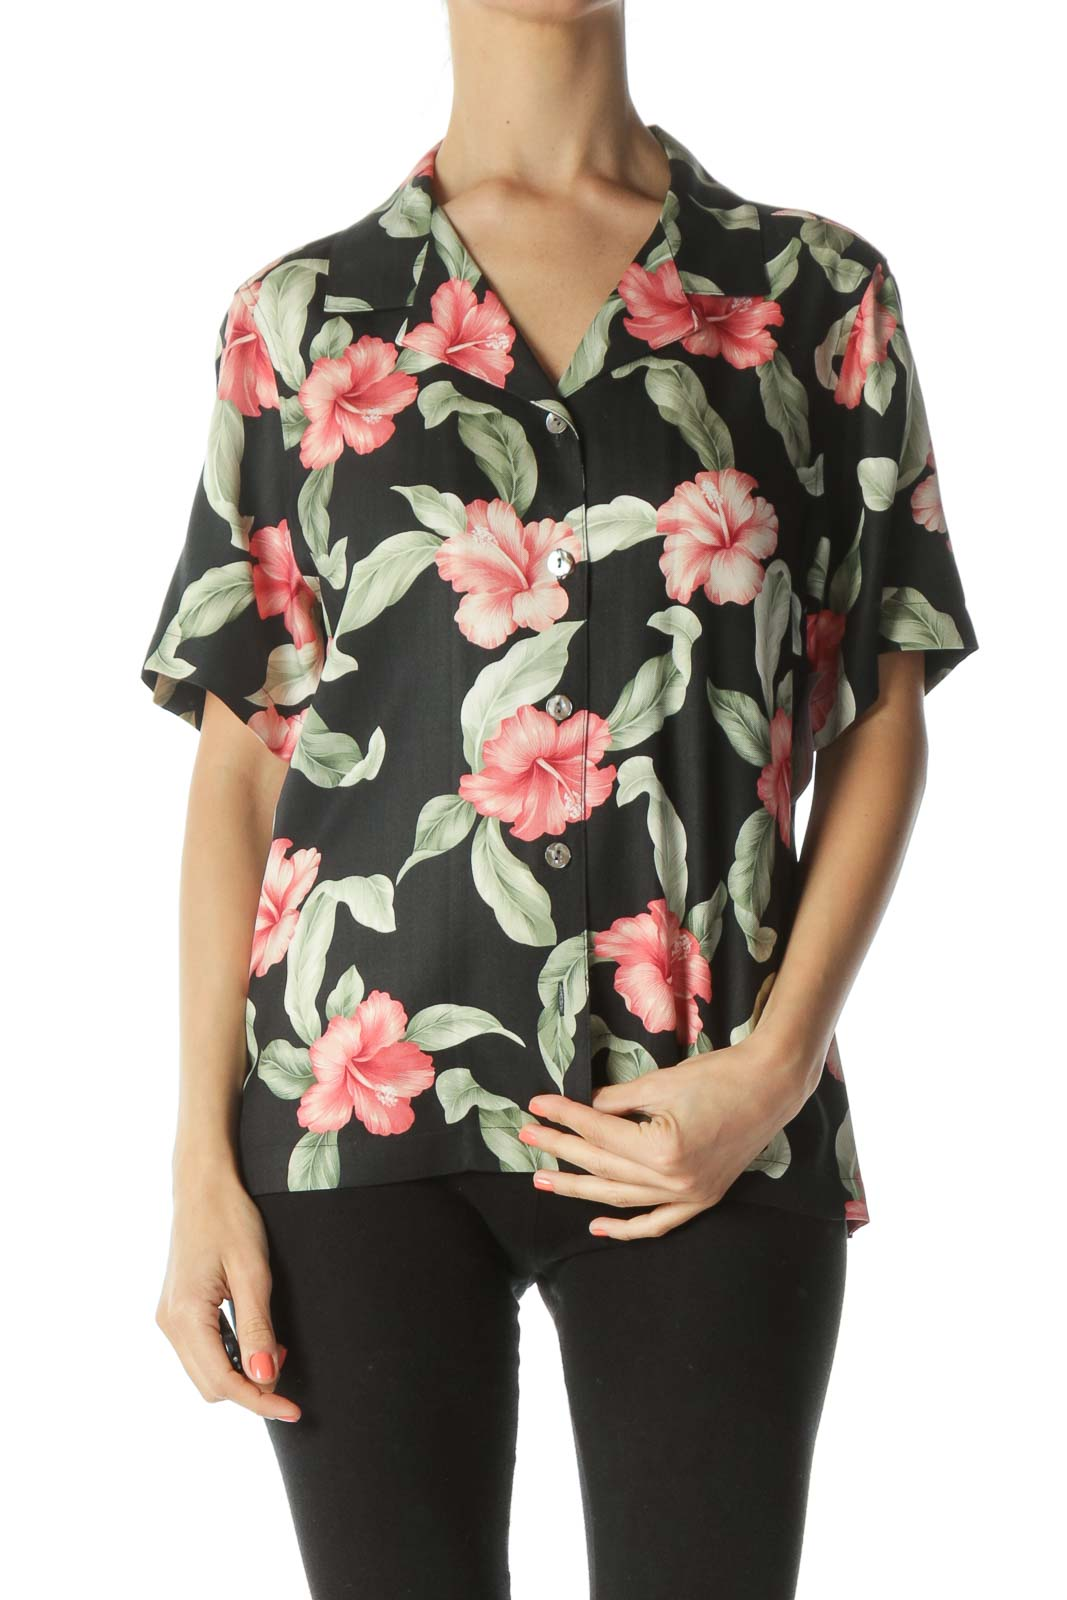 Black/Green/Pink 100% Silk Floral-Print Buttoned T-Shirt